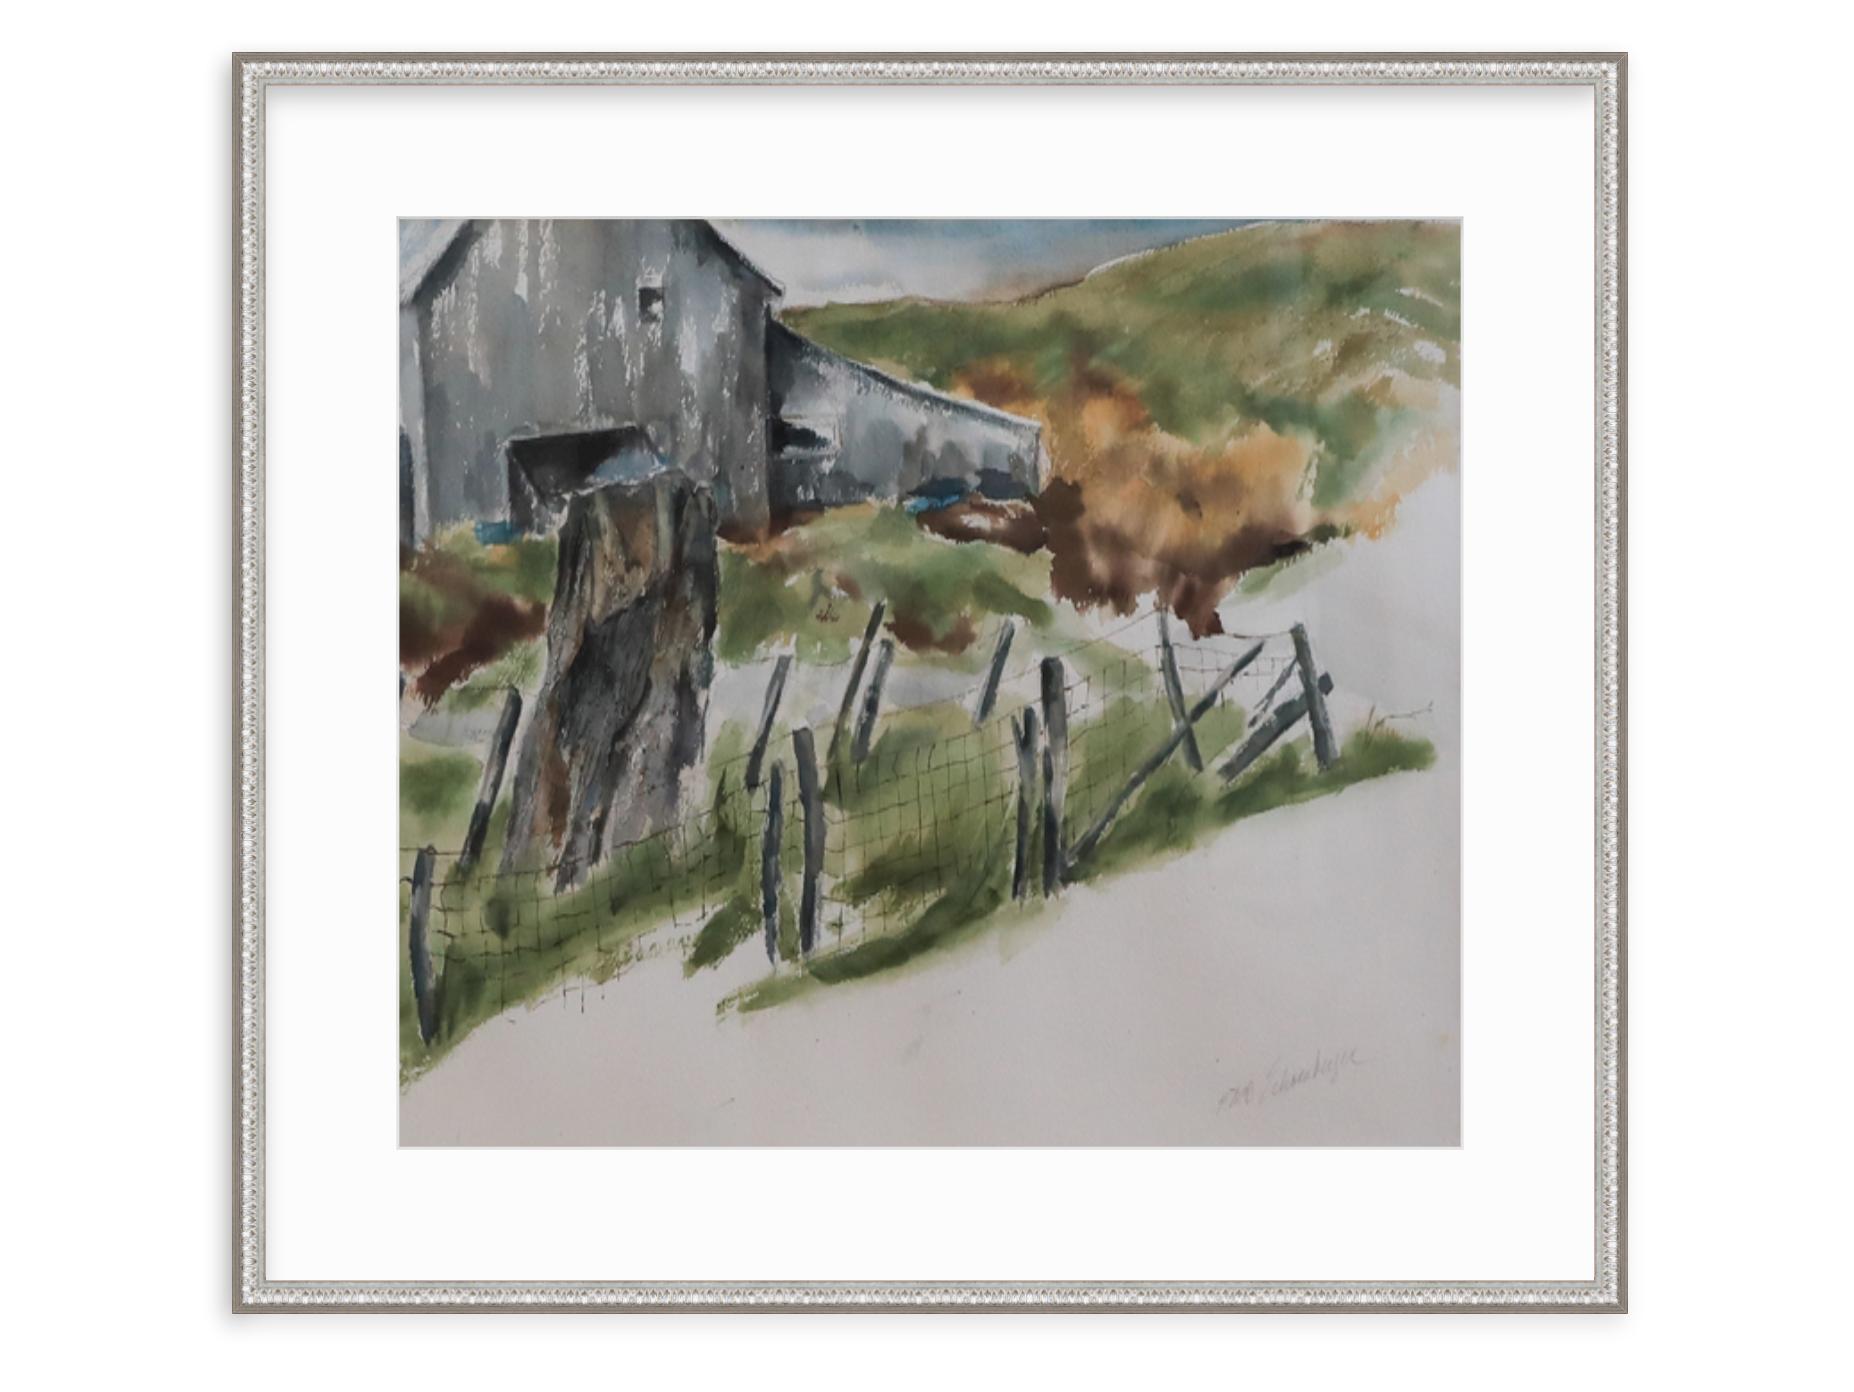 25) The Barn